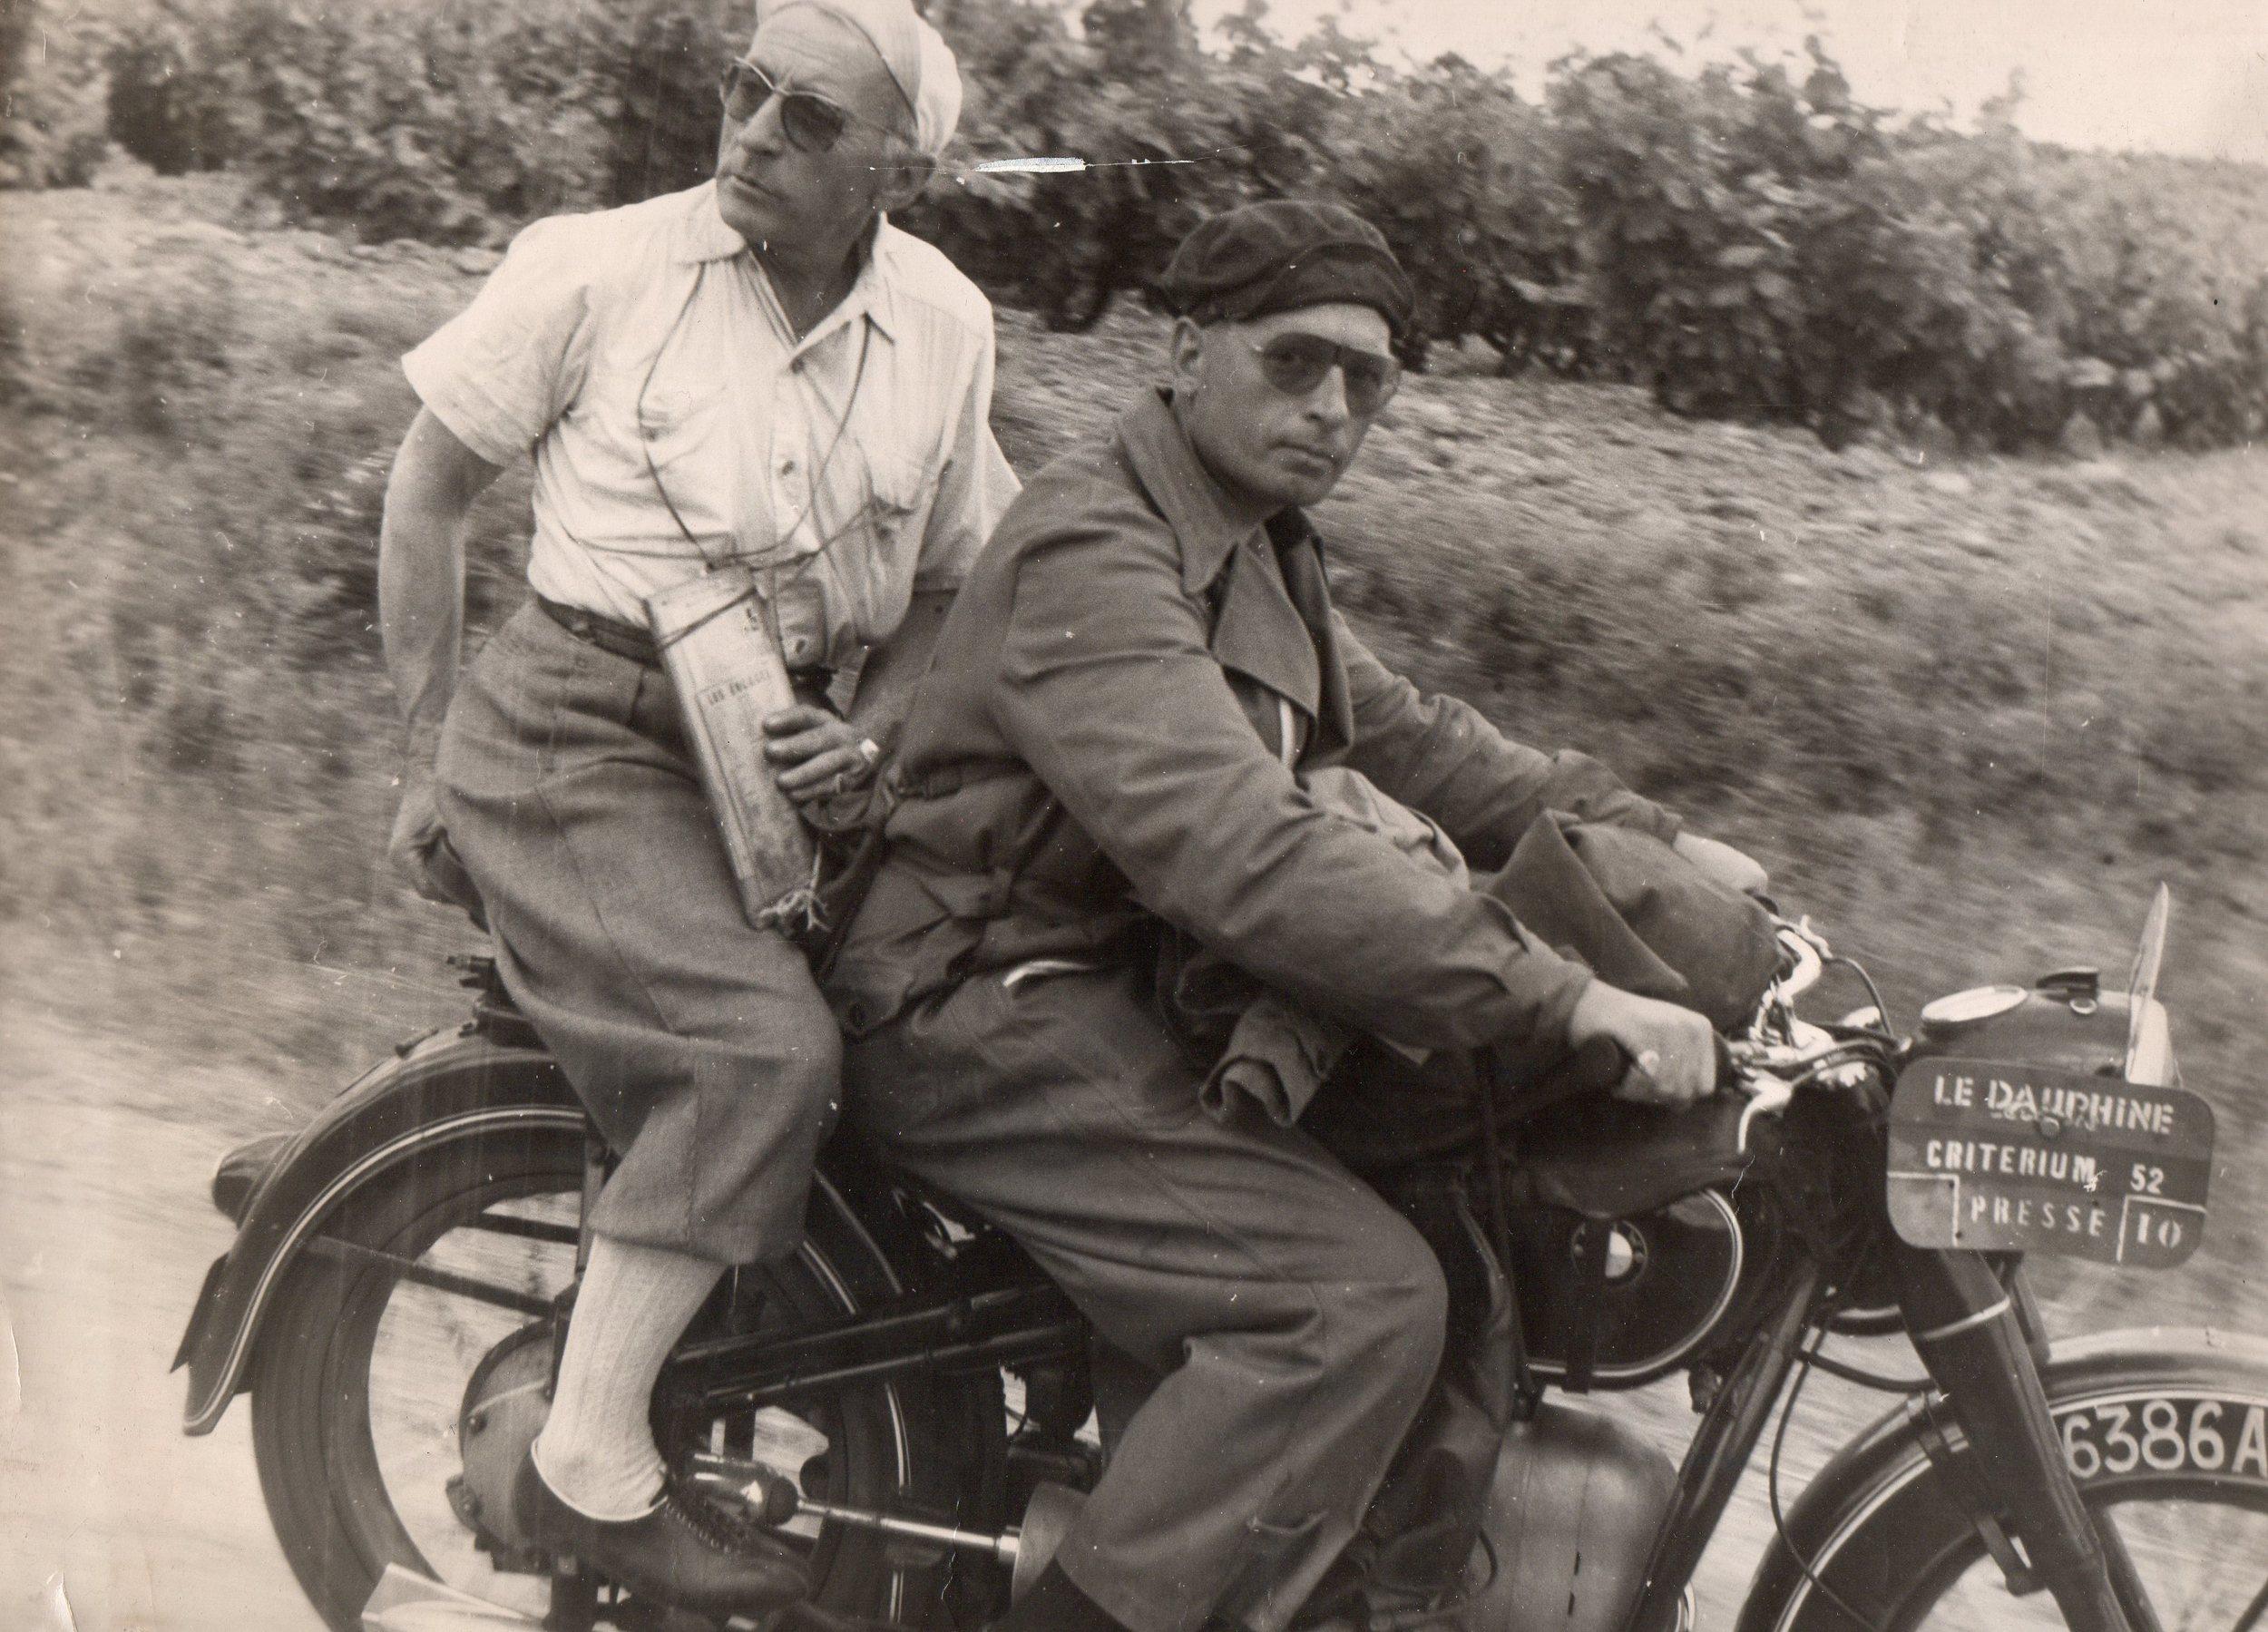 French radio reporter and bon vivant Alex Virot and his driver René Wagner during the 1952 Critérium du Dauphiné